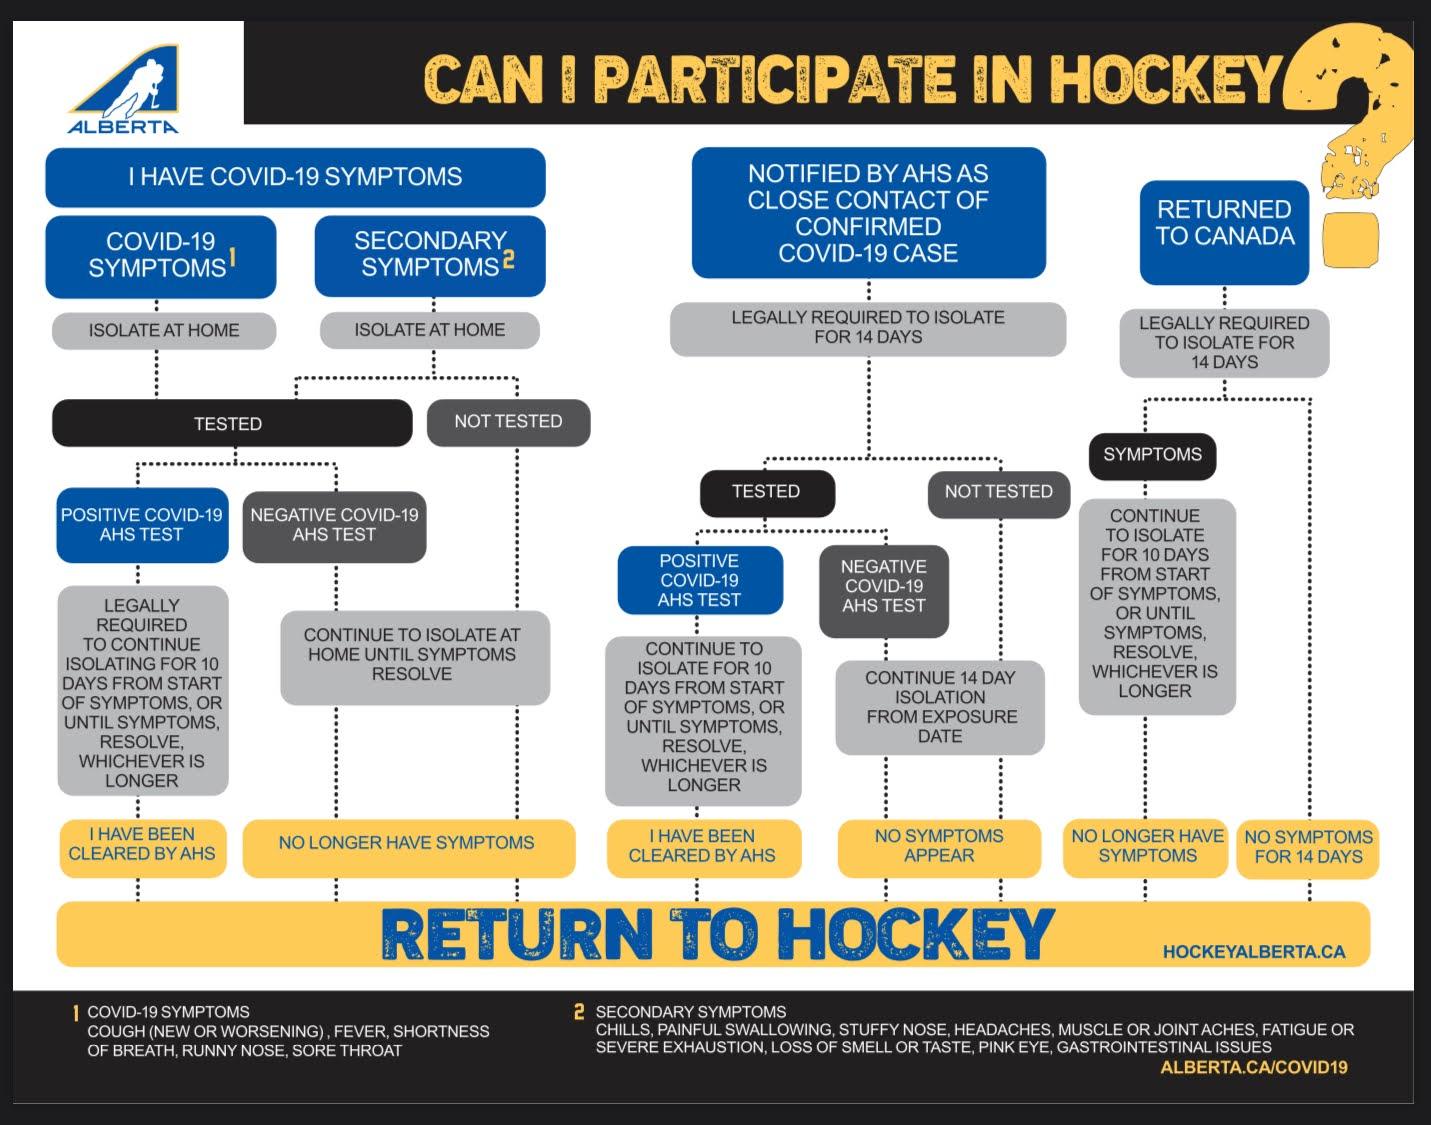 Hockey Albert Covid-19 Return to Play Flow Chart